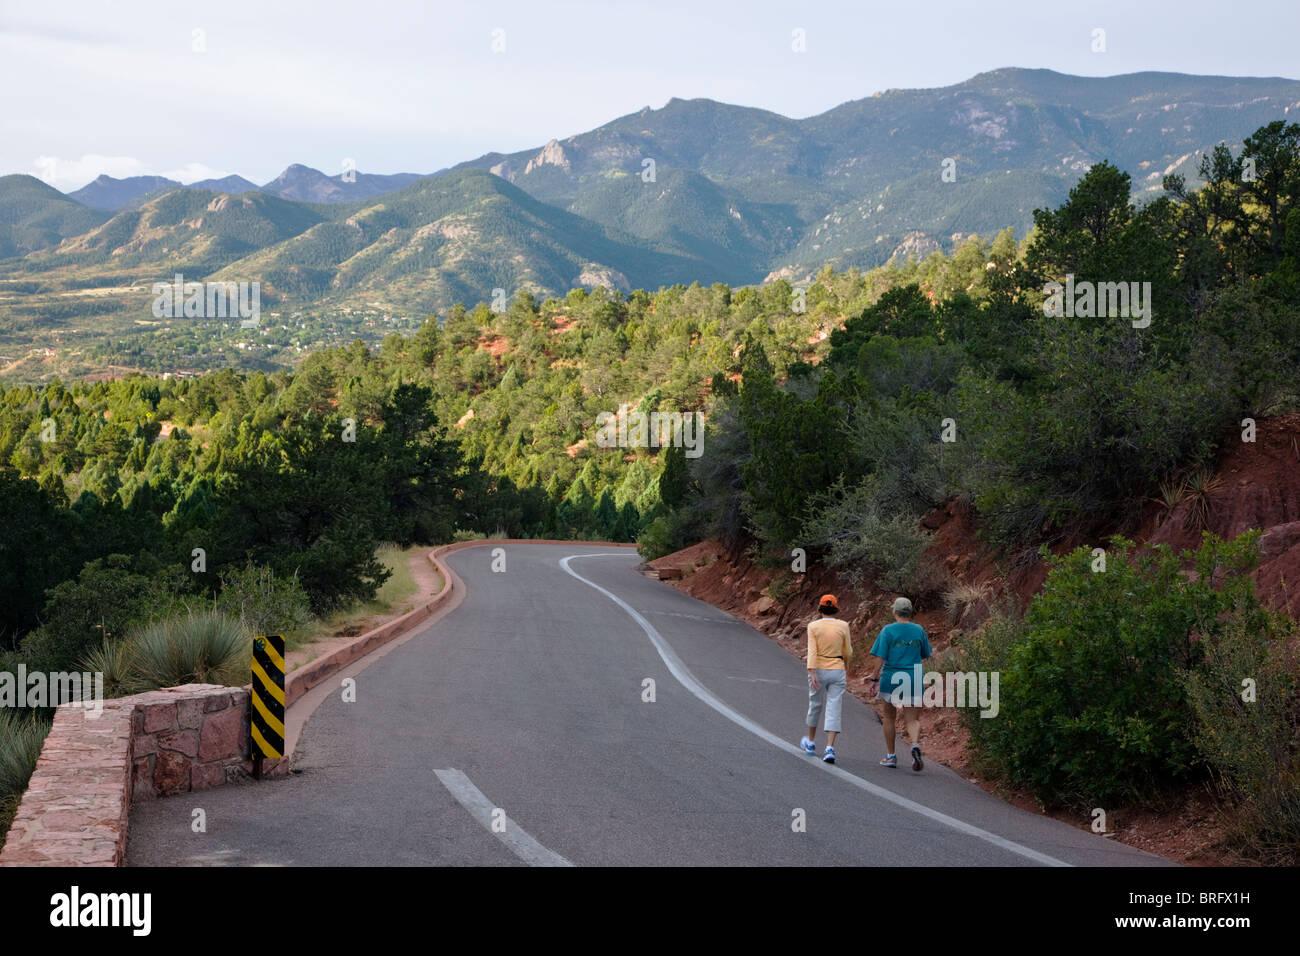 Visitors walking for exercise, Garden of the Gods, National Natural Landmark, Colorado Springs, Colorado, USA - Stock Image